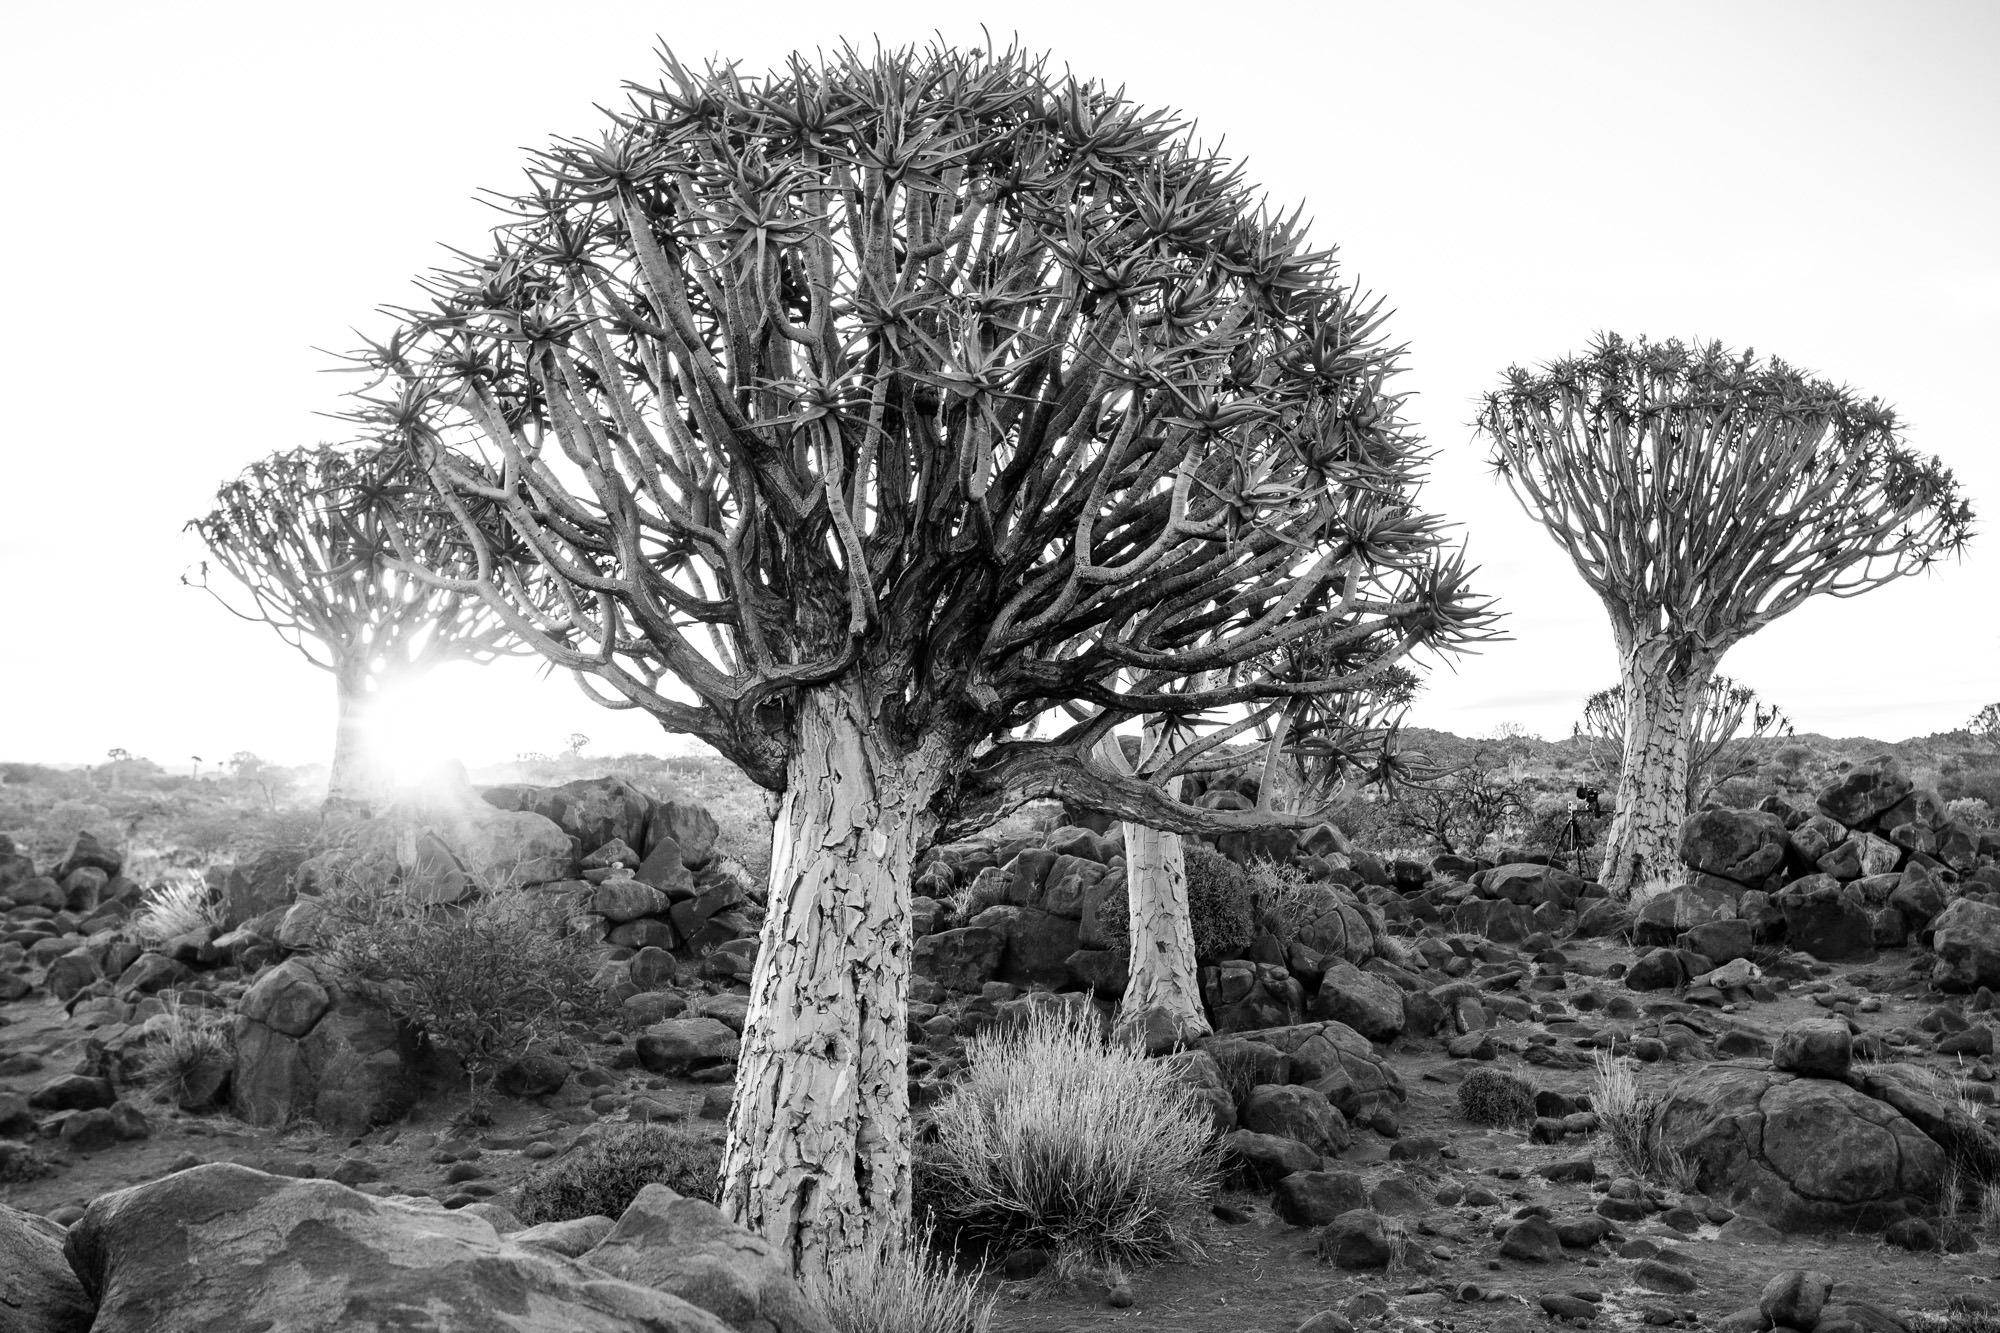 Schwarz Weiss Quivertree Forest Köcherbaumwald Keetmanshoop Namibia